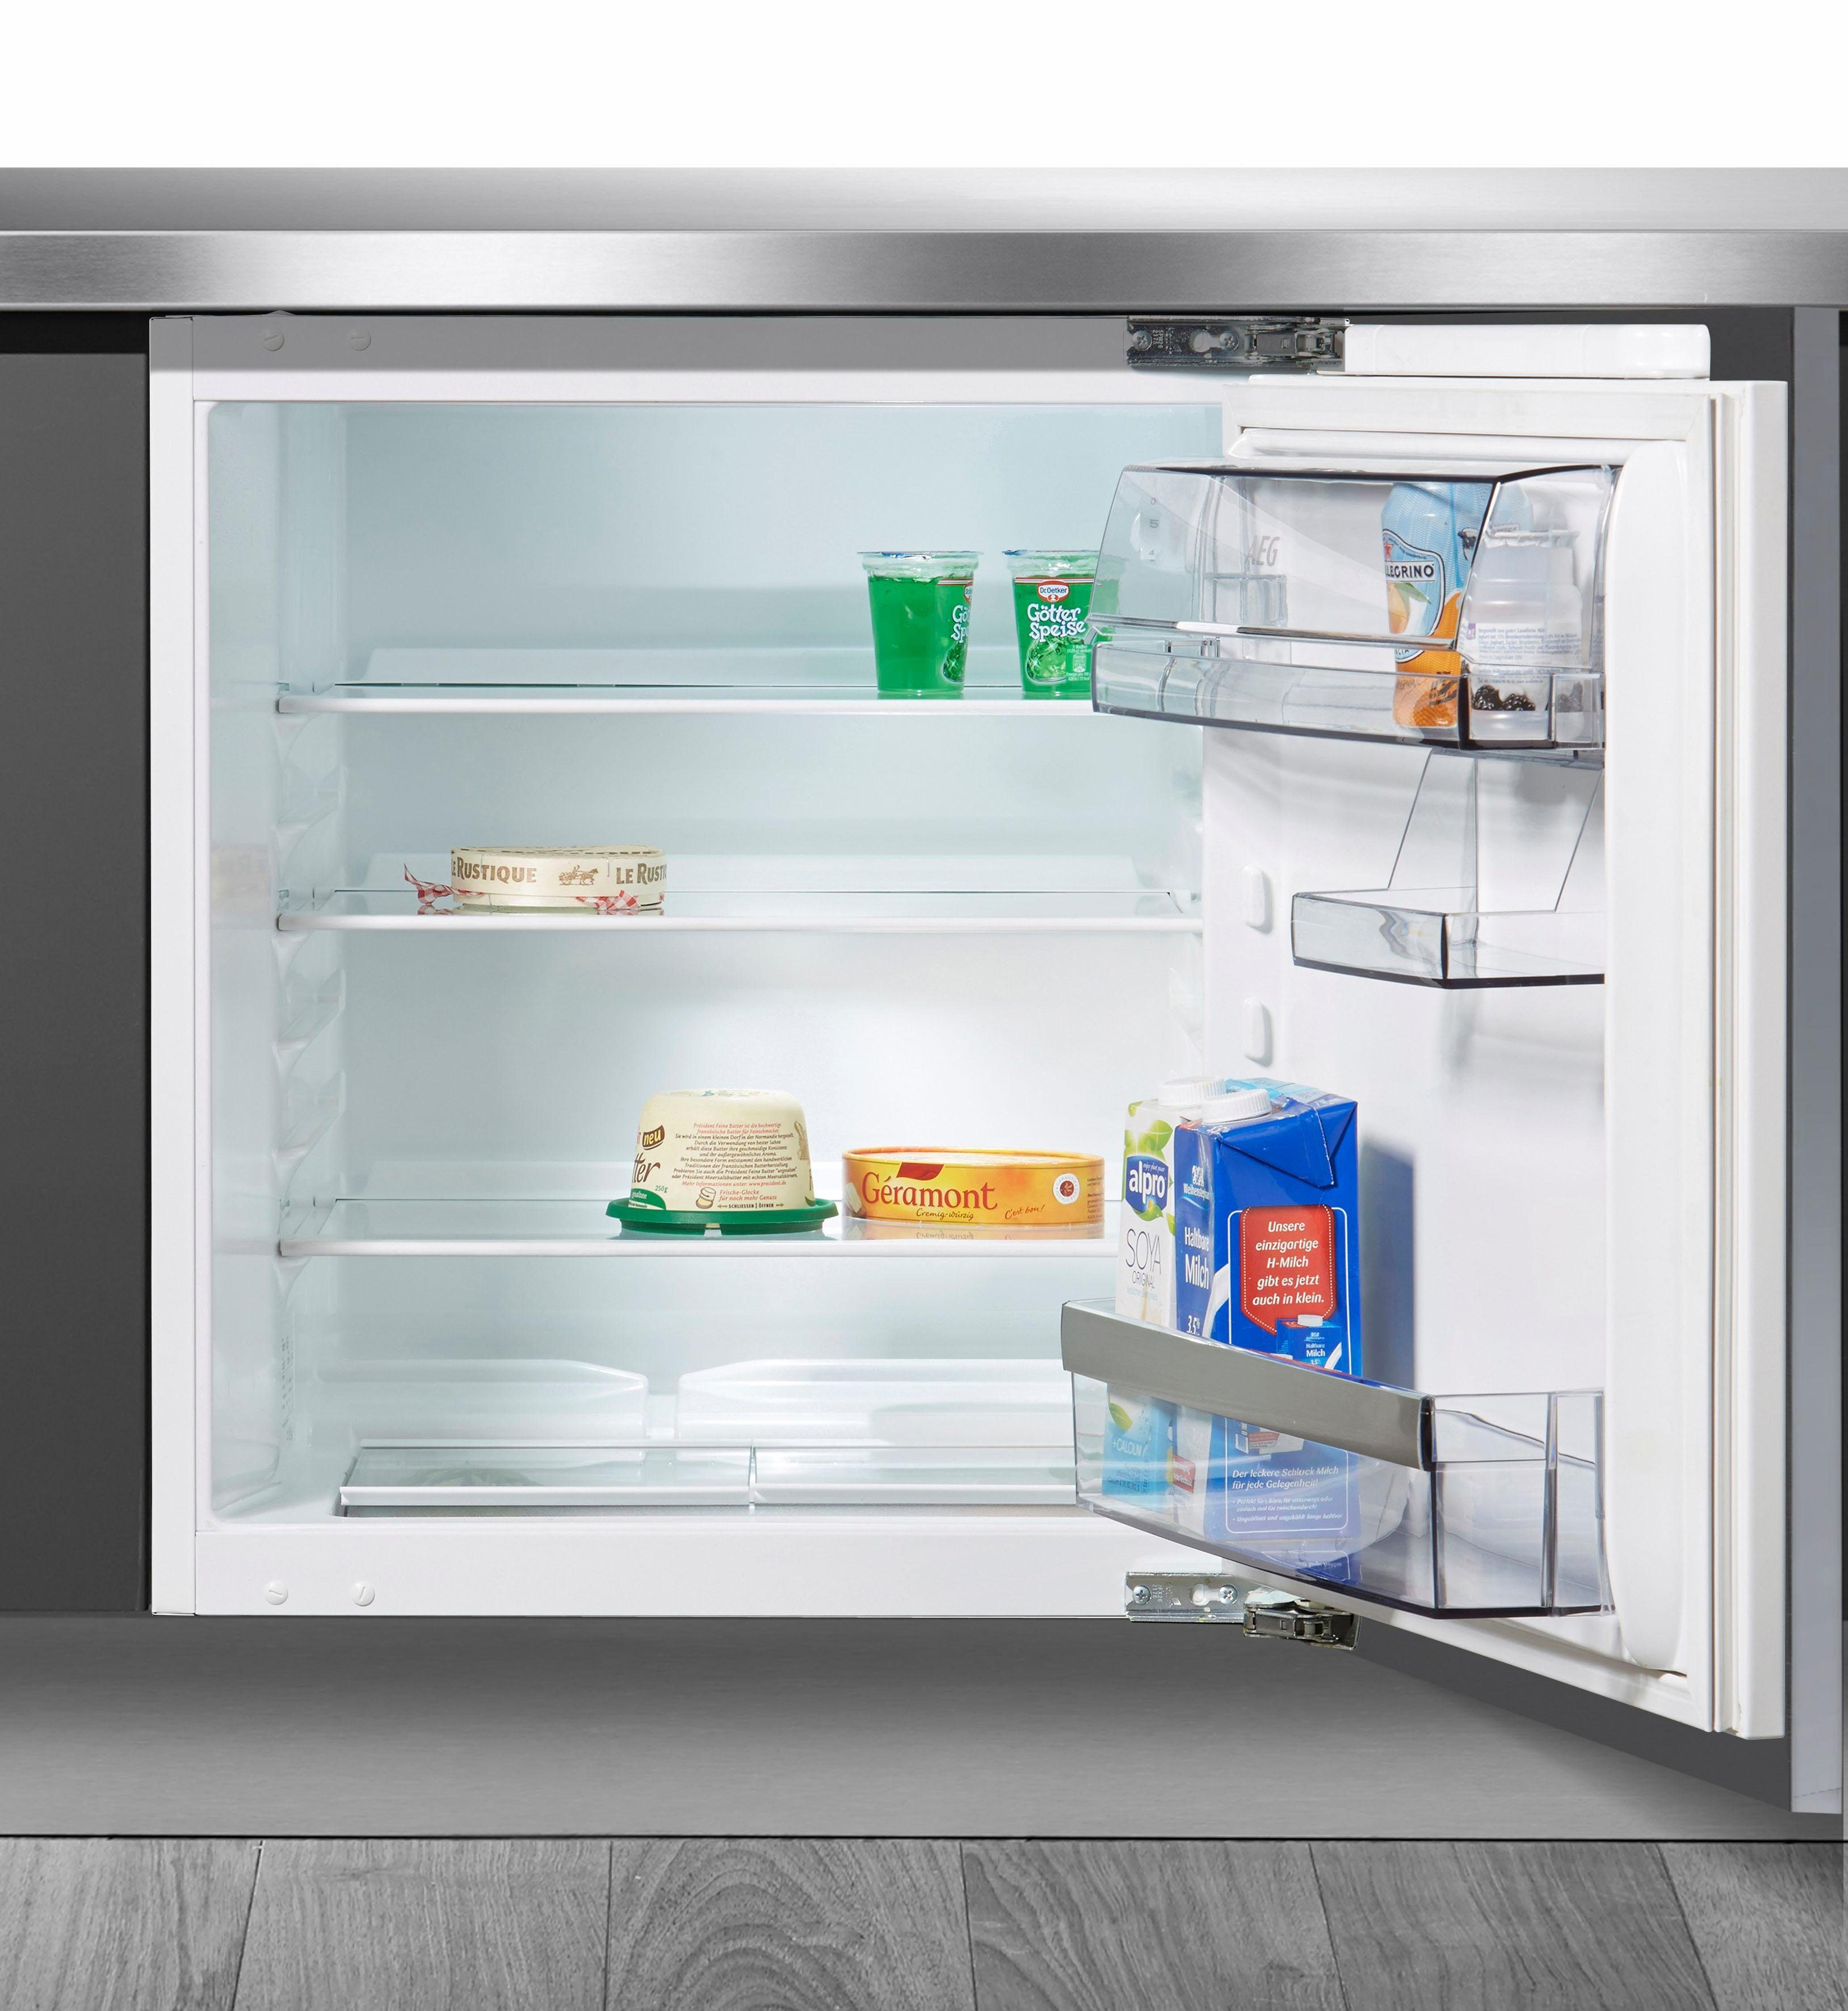 AEG integrierbarer Einbaukühlschrank Santo SKB58211AF, Energieklasse A++, 81,5 cm hoch